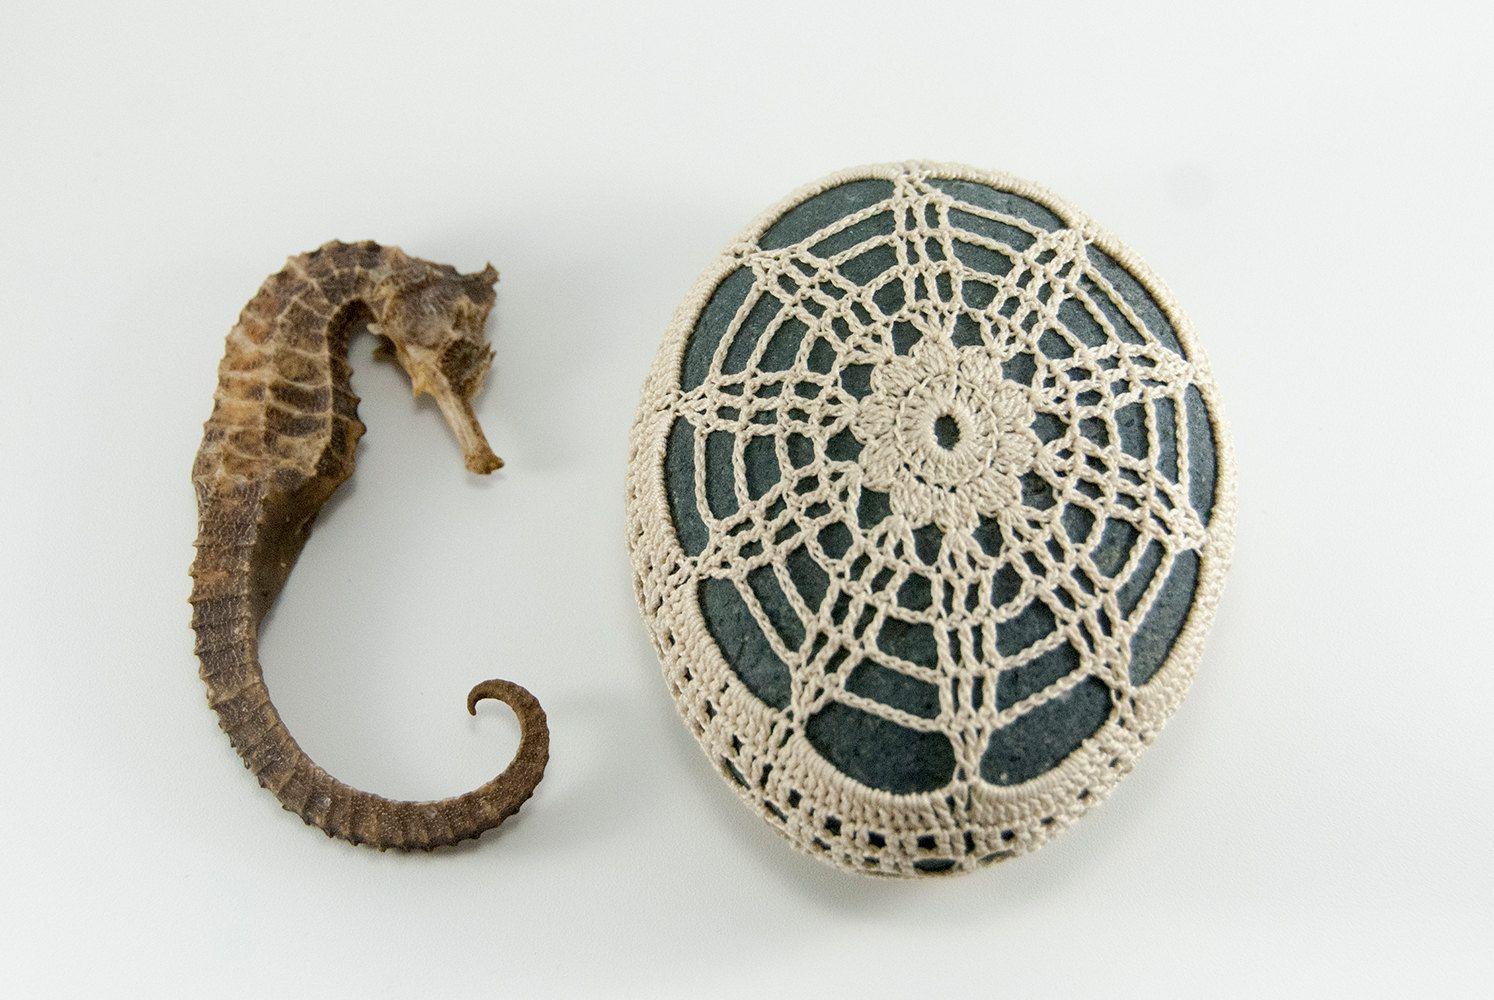 crochet lace stone beach wedding river rock sea by TableTopJewels